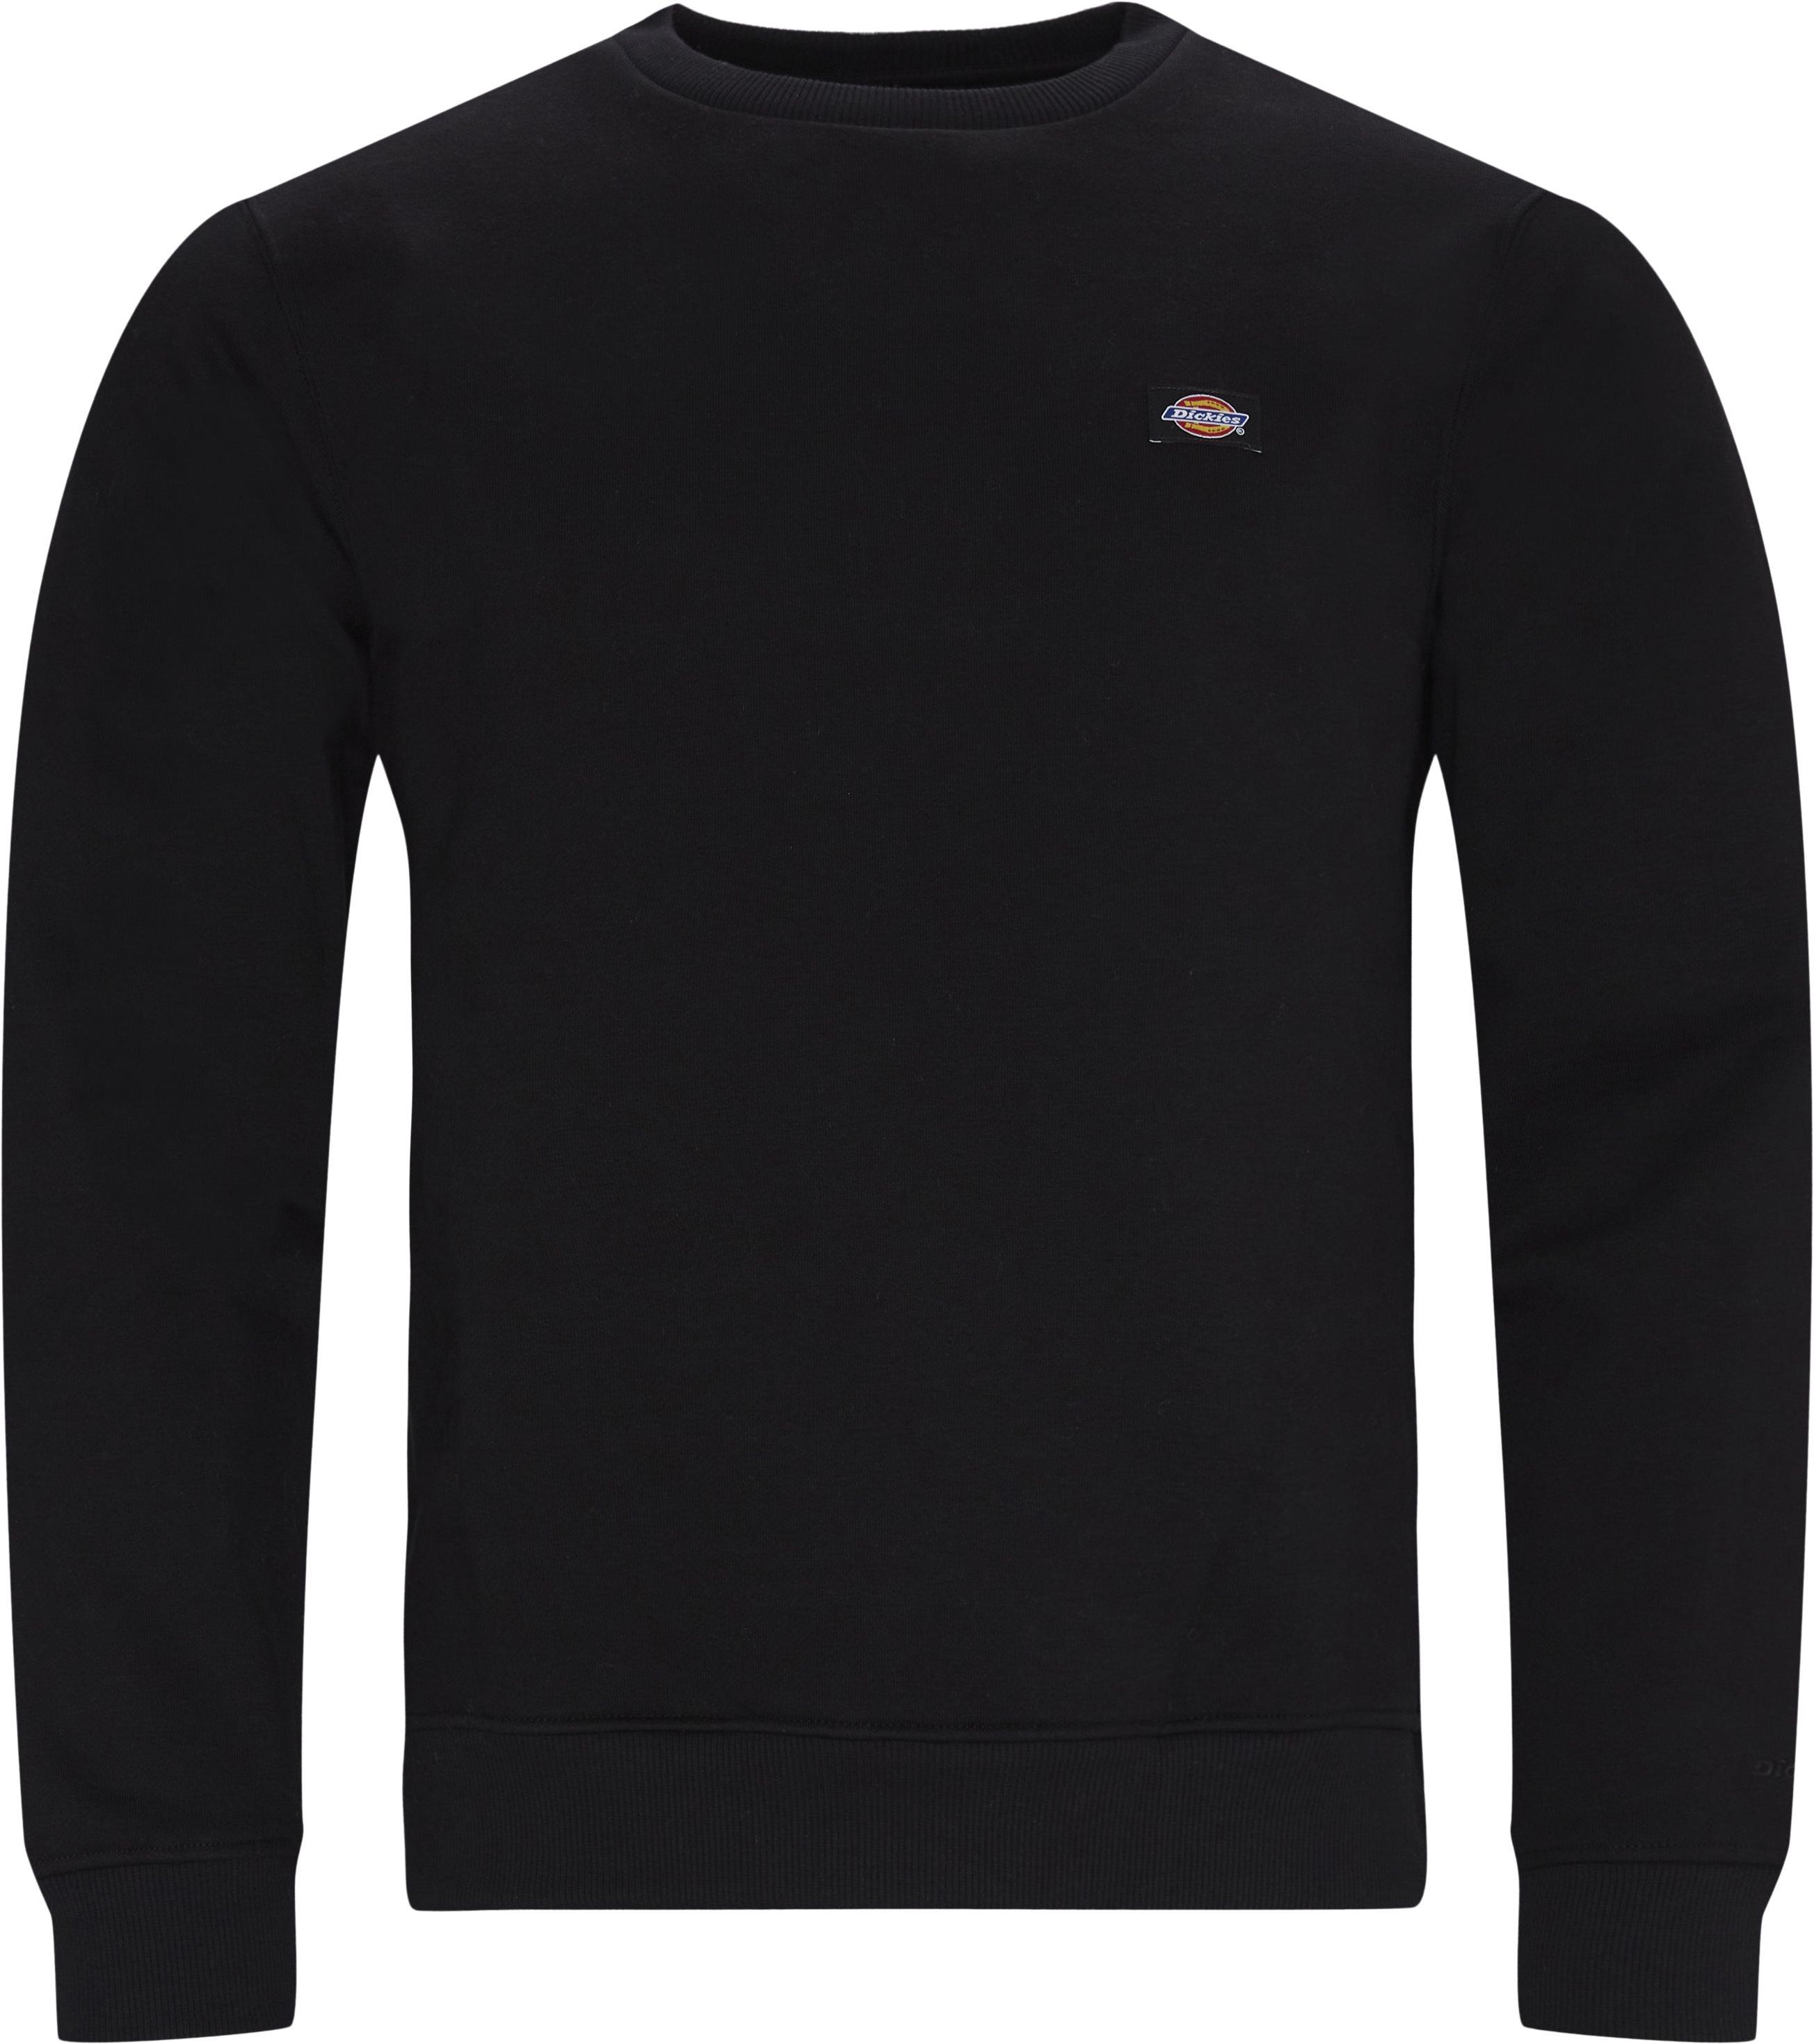 New Jersey Crewneck Sweatshirt - Sweatshirts - Regular - Sort